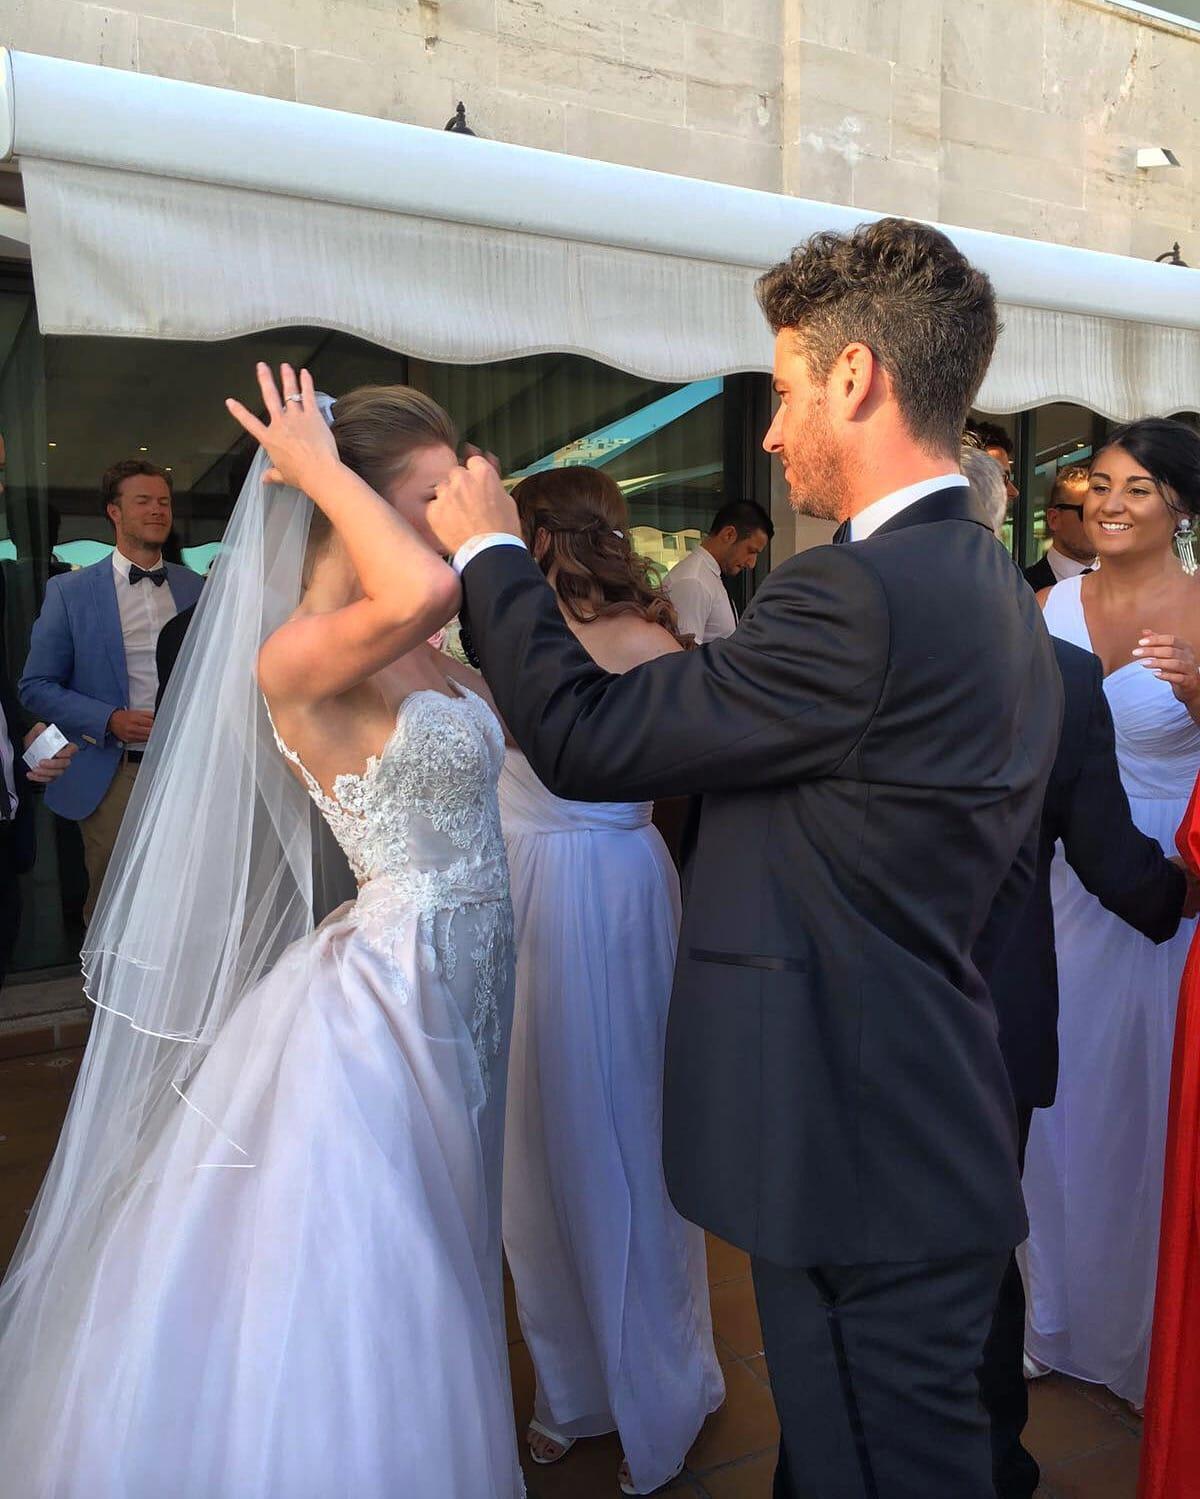 901087b36aa8 Wedding Jumpsuit With Detachable Skirt - Best Wedding Ampleimage.co